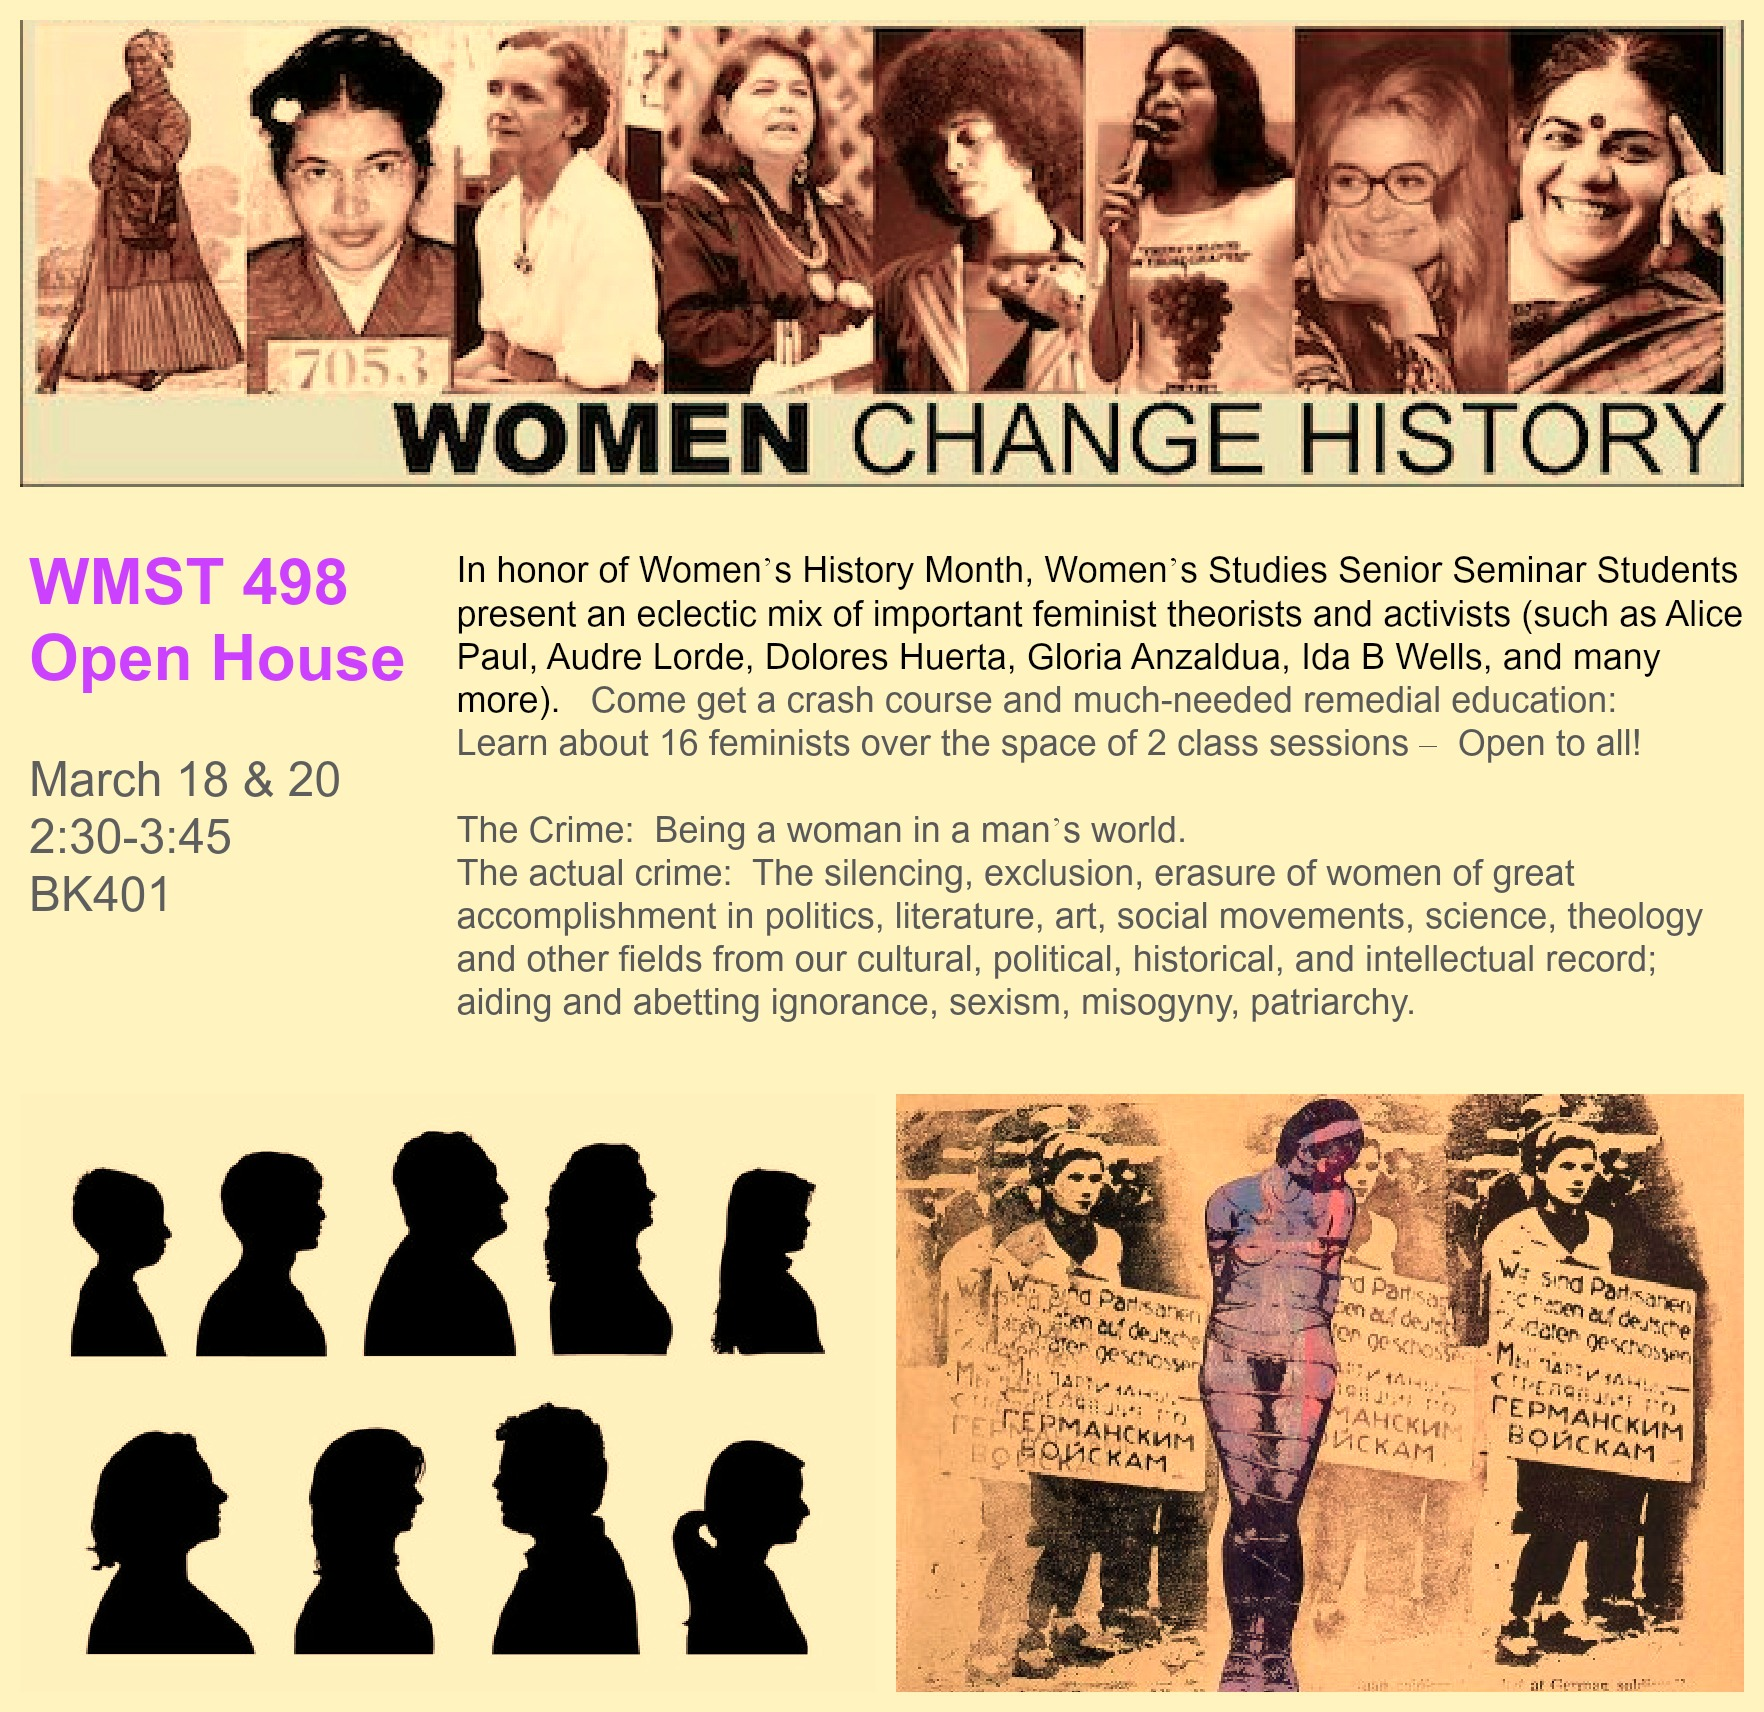 Flyer for Women Change History